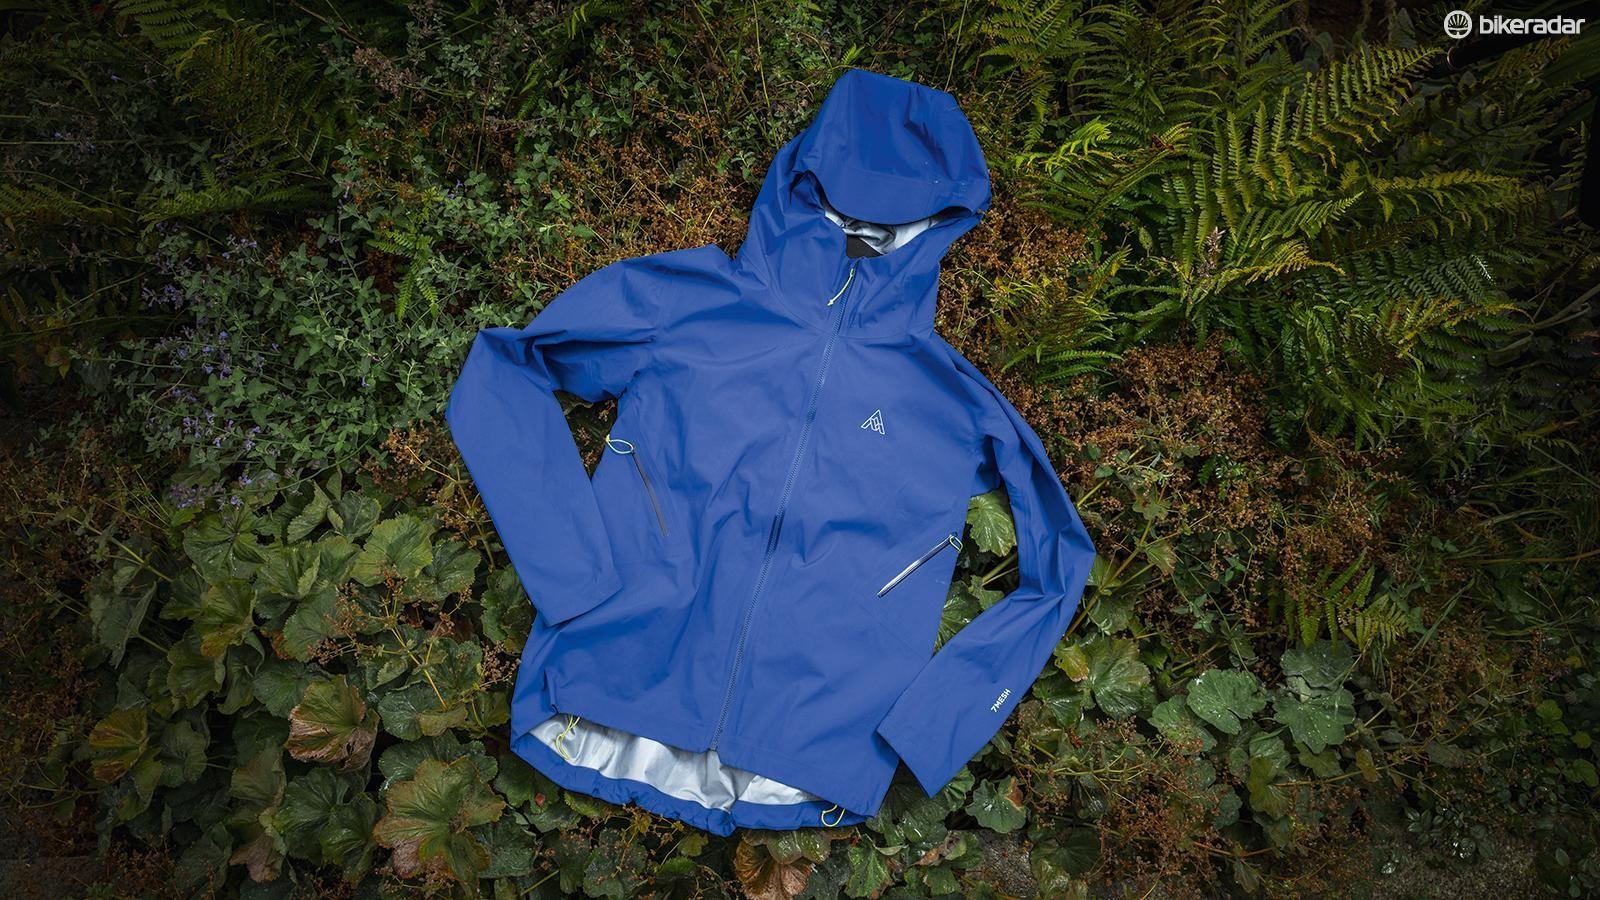 7Mesh's Guardian jacket